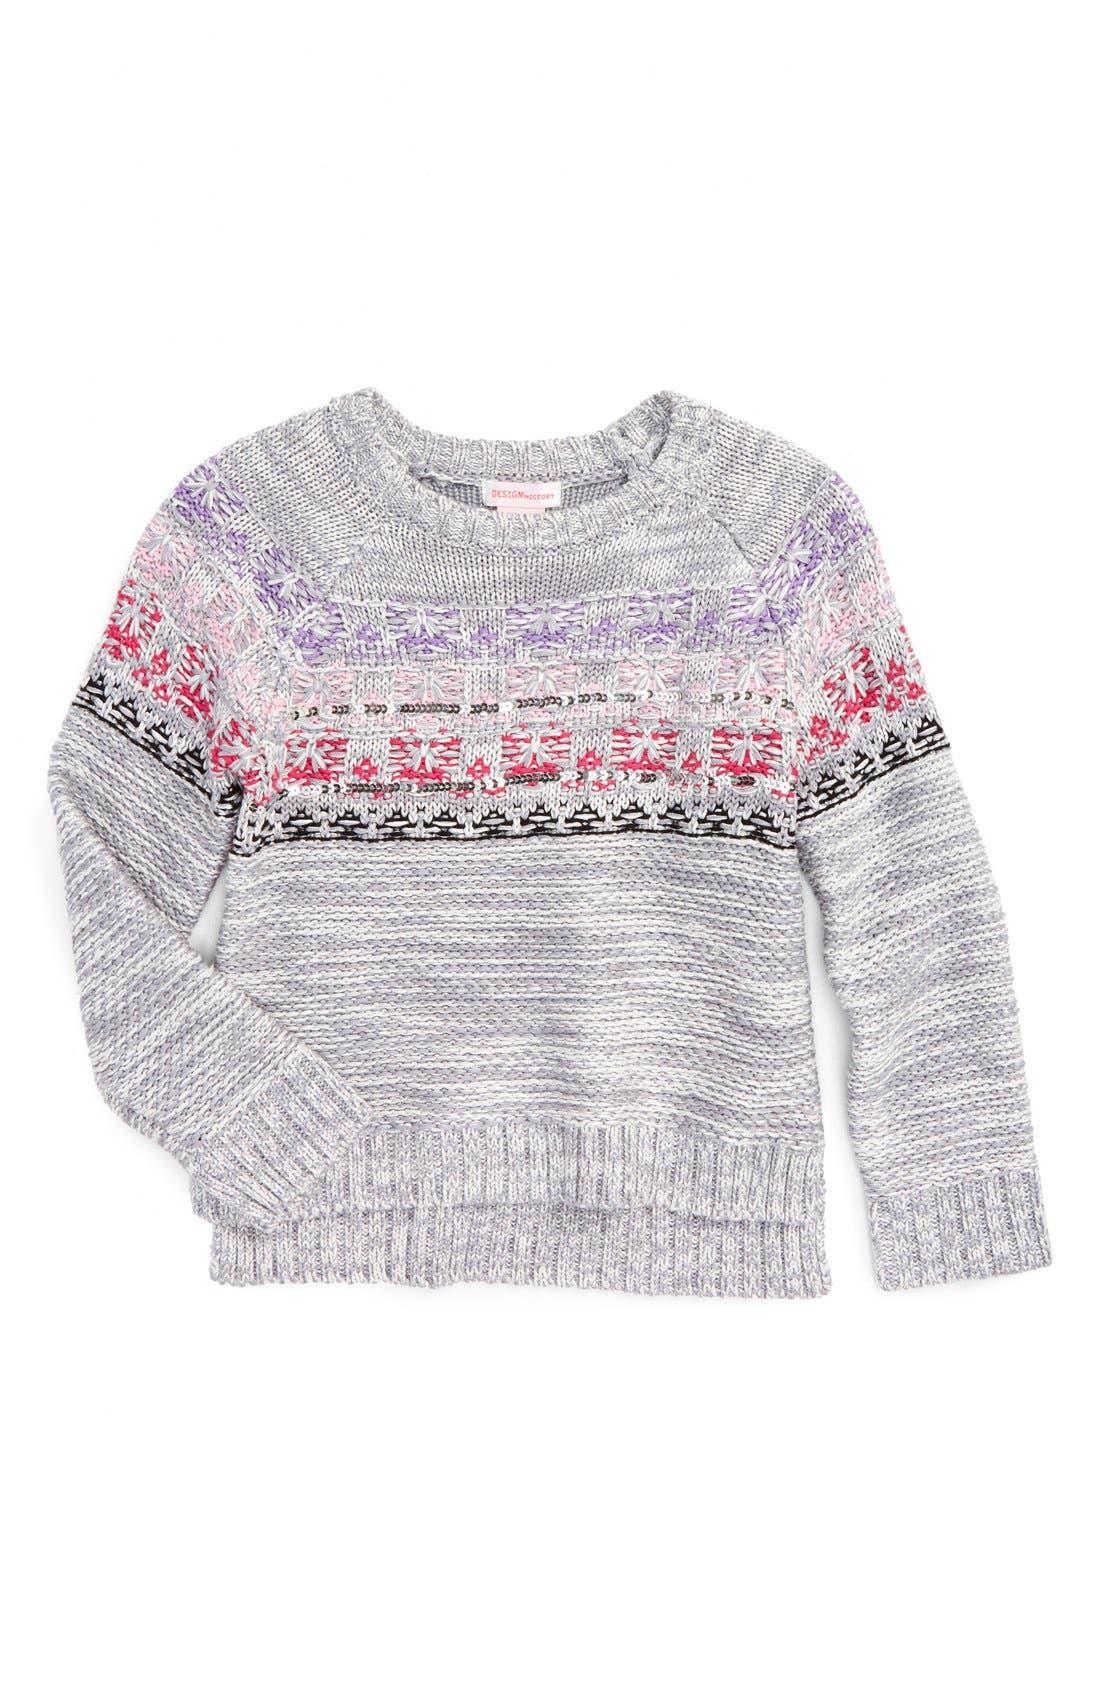 Main Image - Design History Embellished Knit Sweater (Toddler Girls & Little Girls)